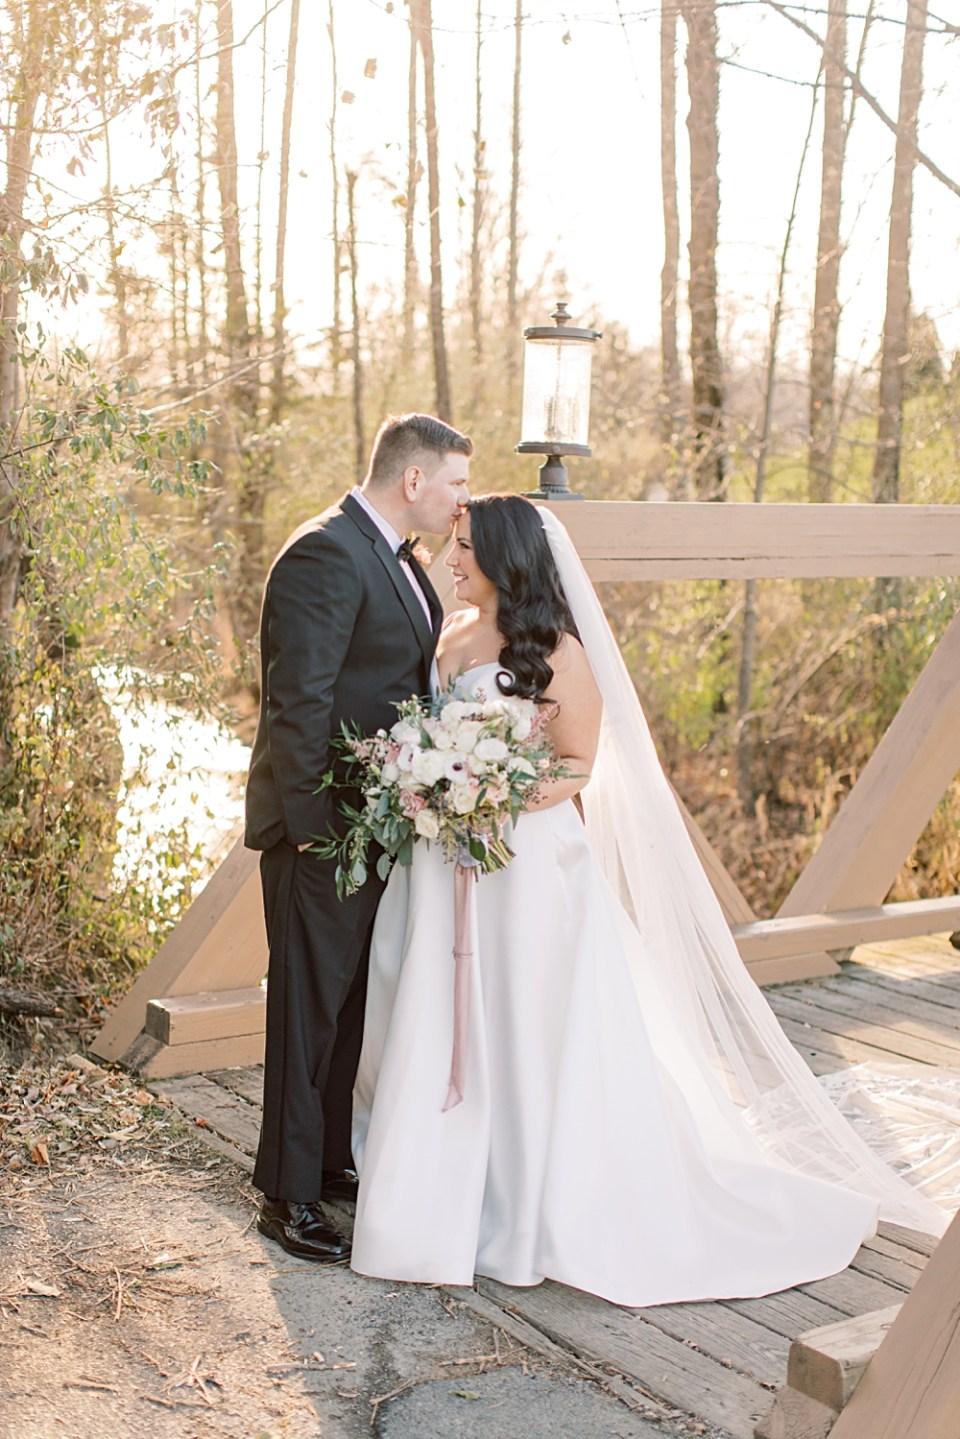 bear brook valley wedding portraits | New Jersey Wedding Photographer Sarah Canning